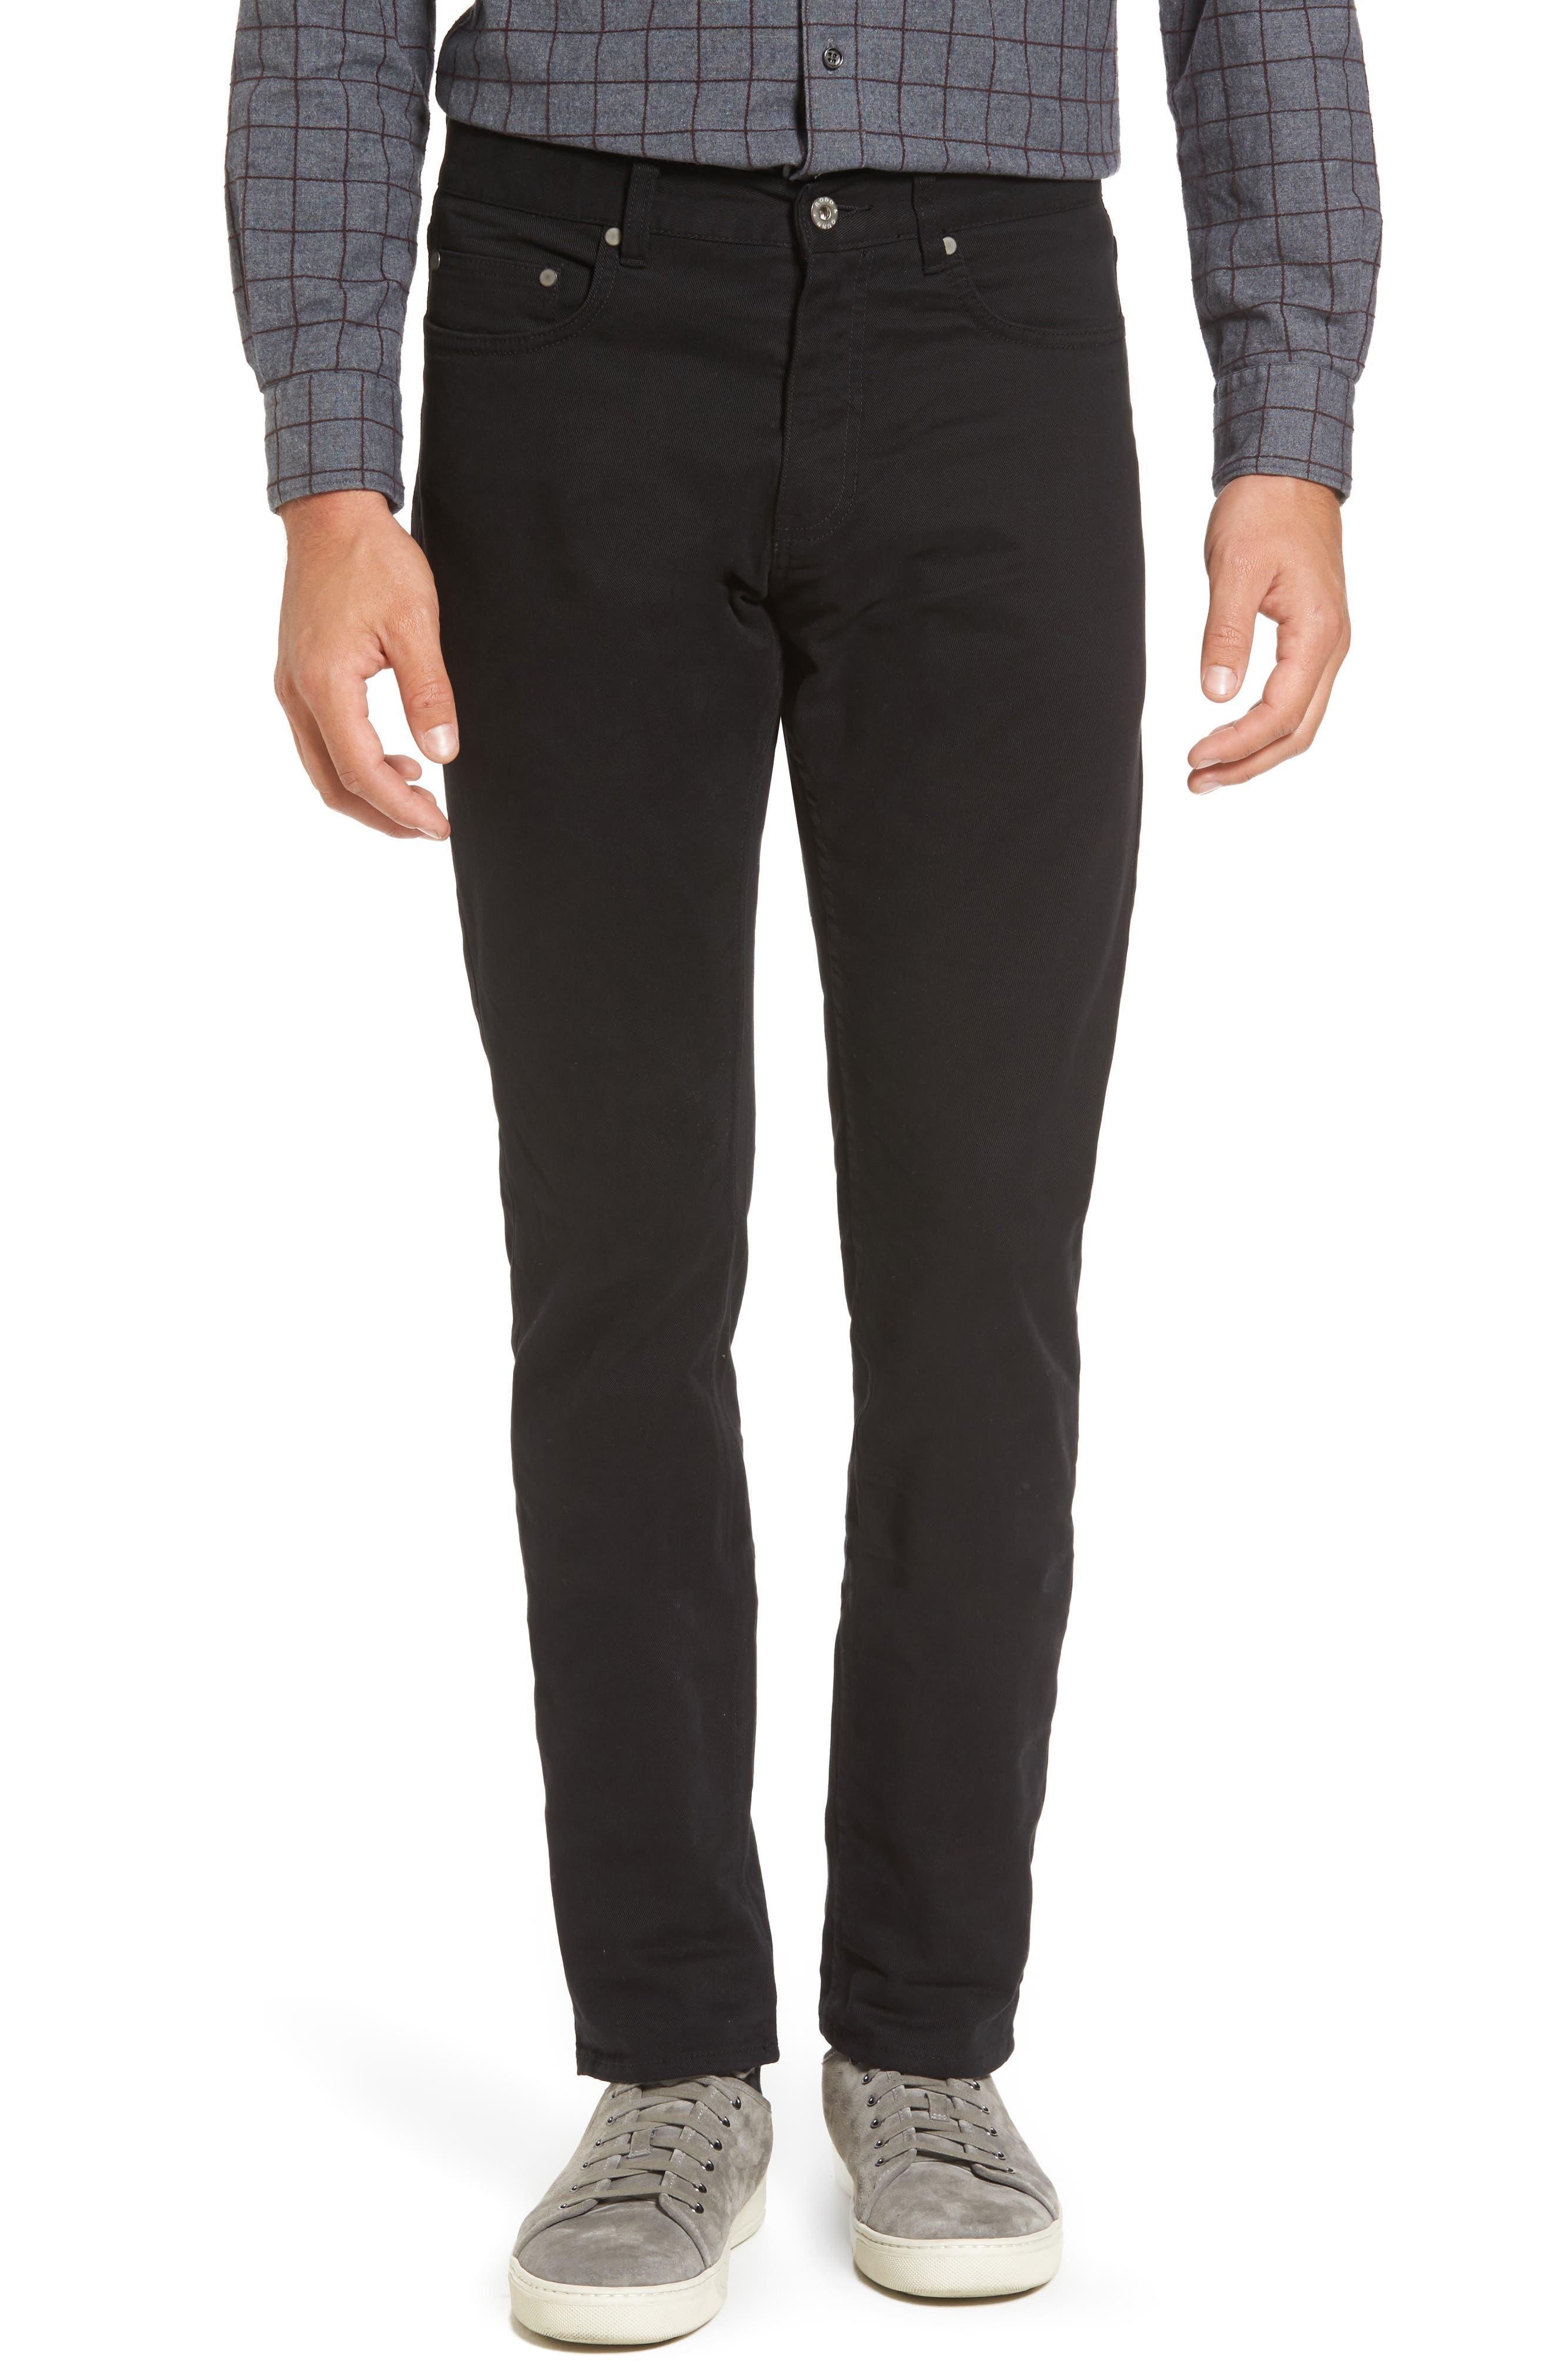 'Barters' Straight Leg Twill Pants,                         Main,                         color, Onyx